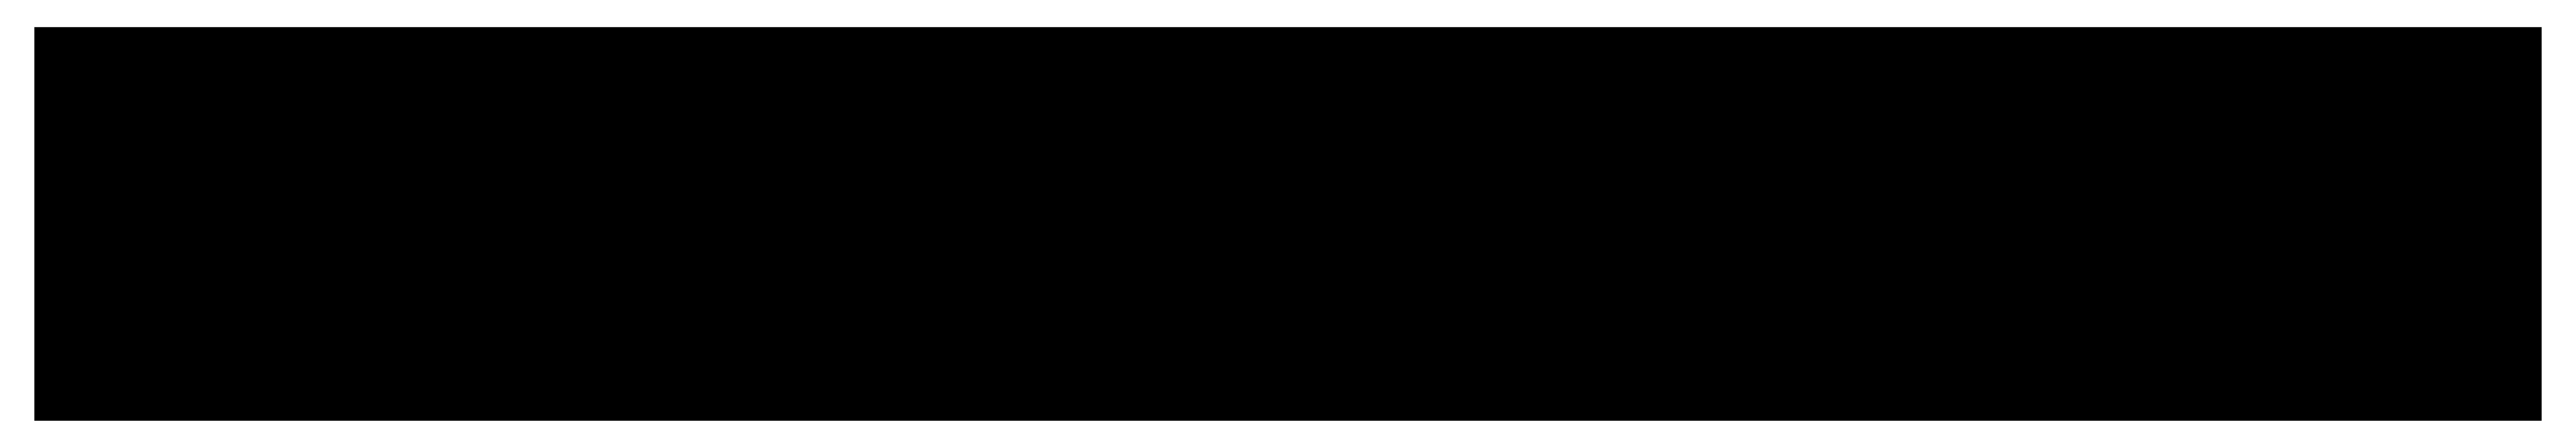 PauliSpirit-Logo_schmalPur-B_200618